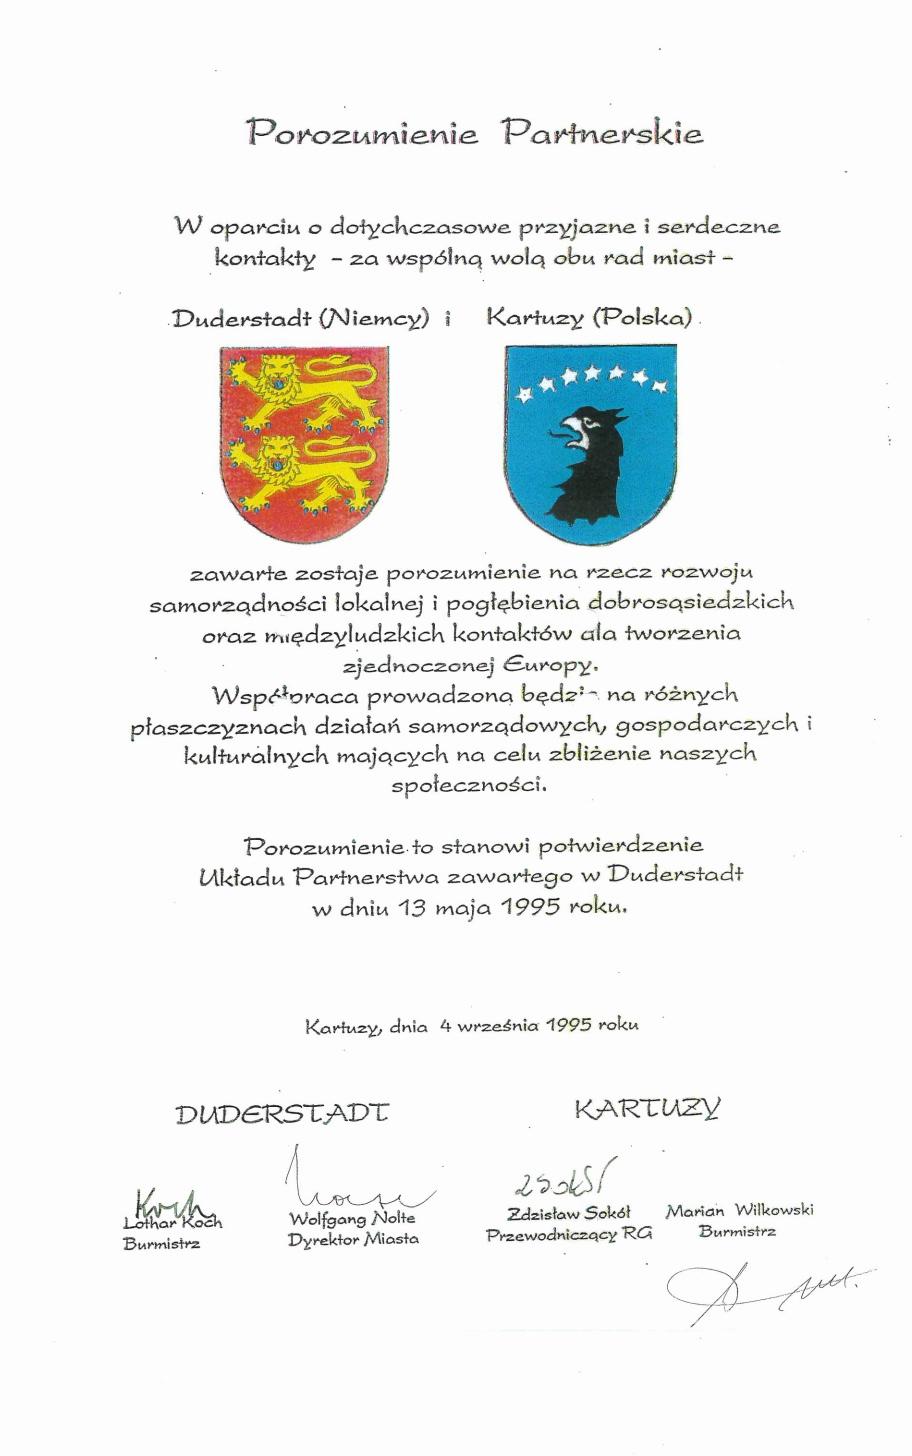 25-lecie partnerstwa gminy Kartuzy i miasta Duderstadt 15